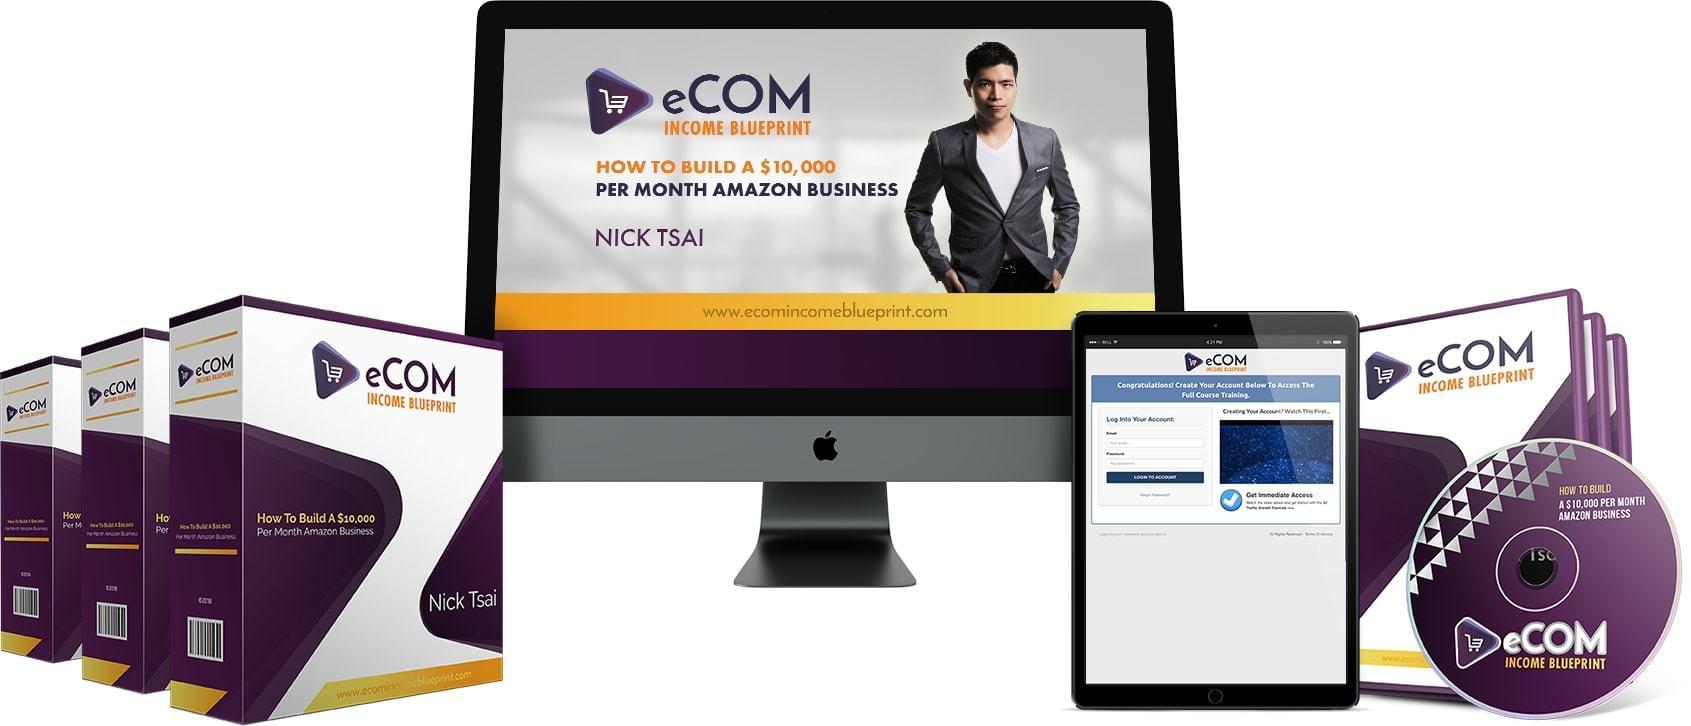 Ecom income blueprint course training malvernweather Images